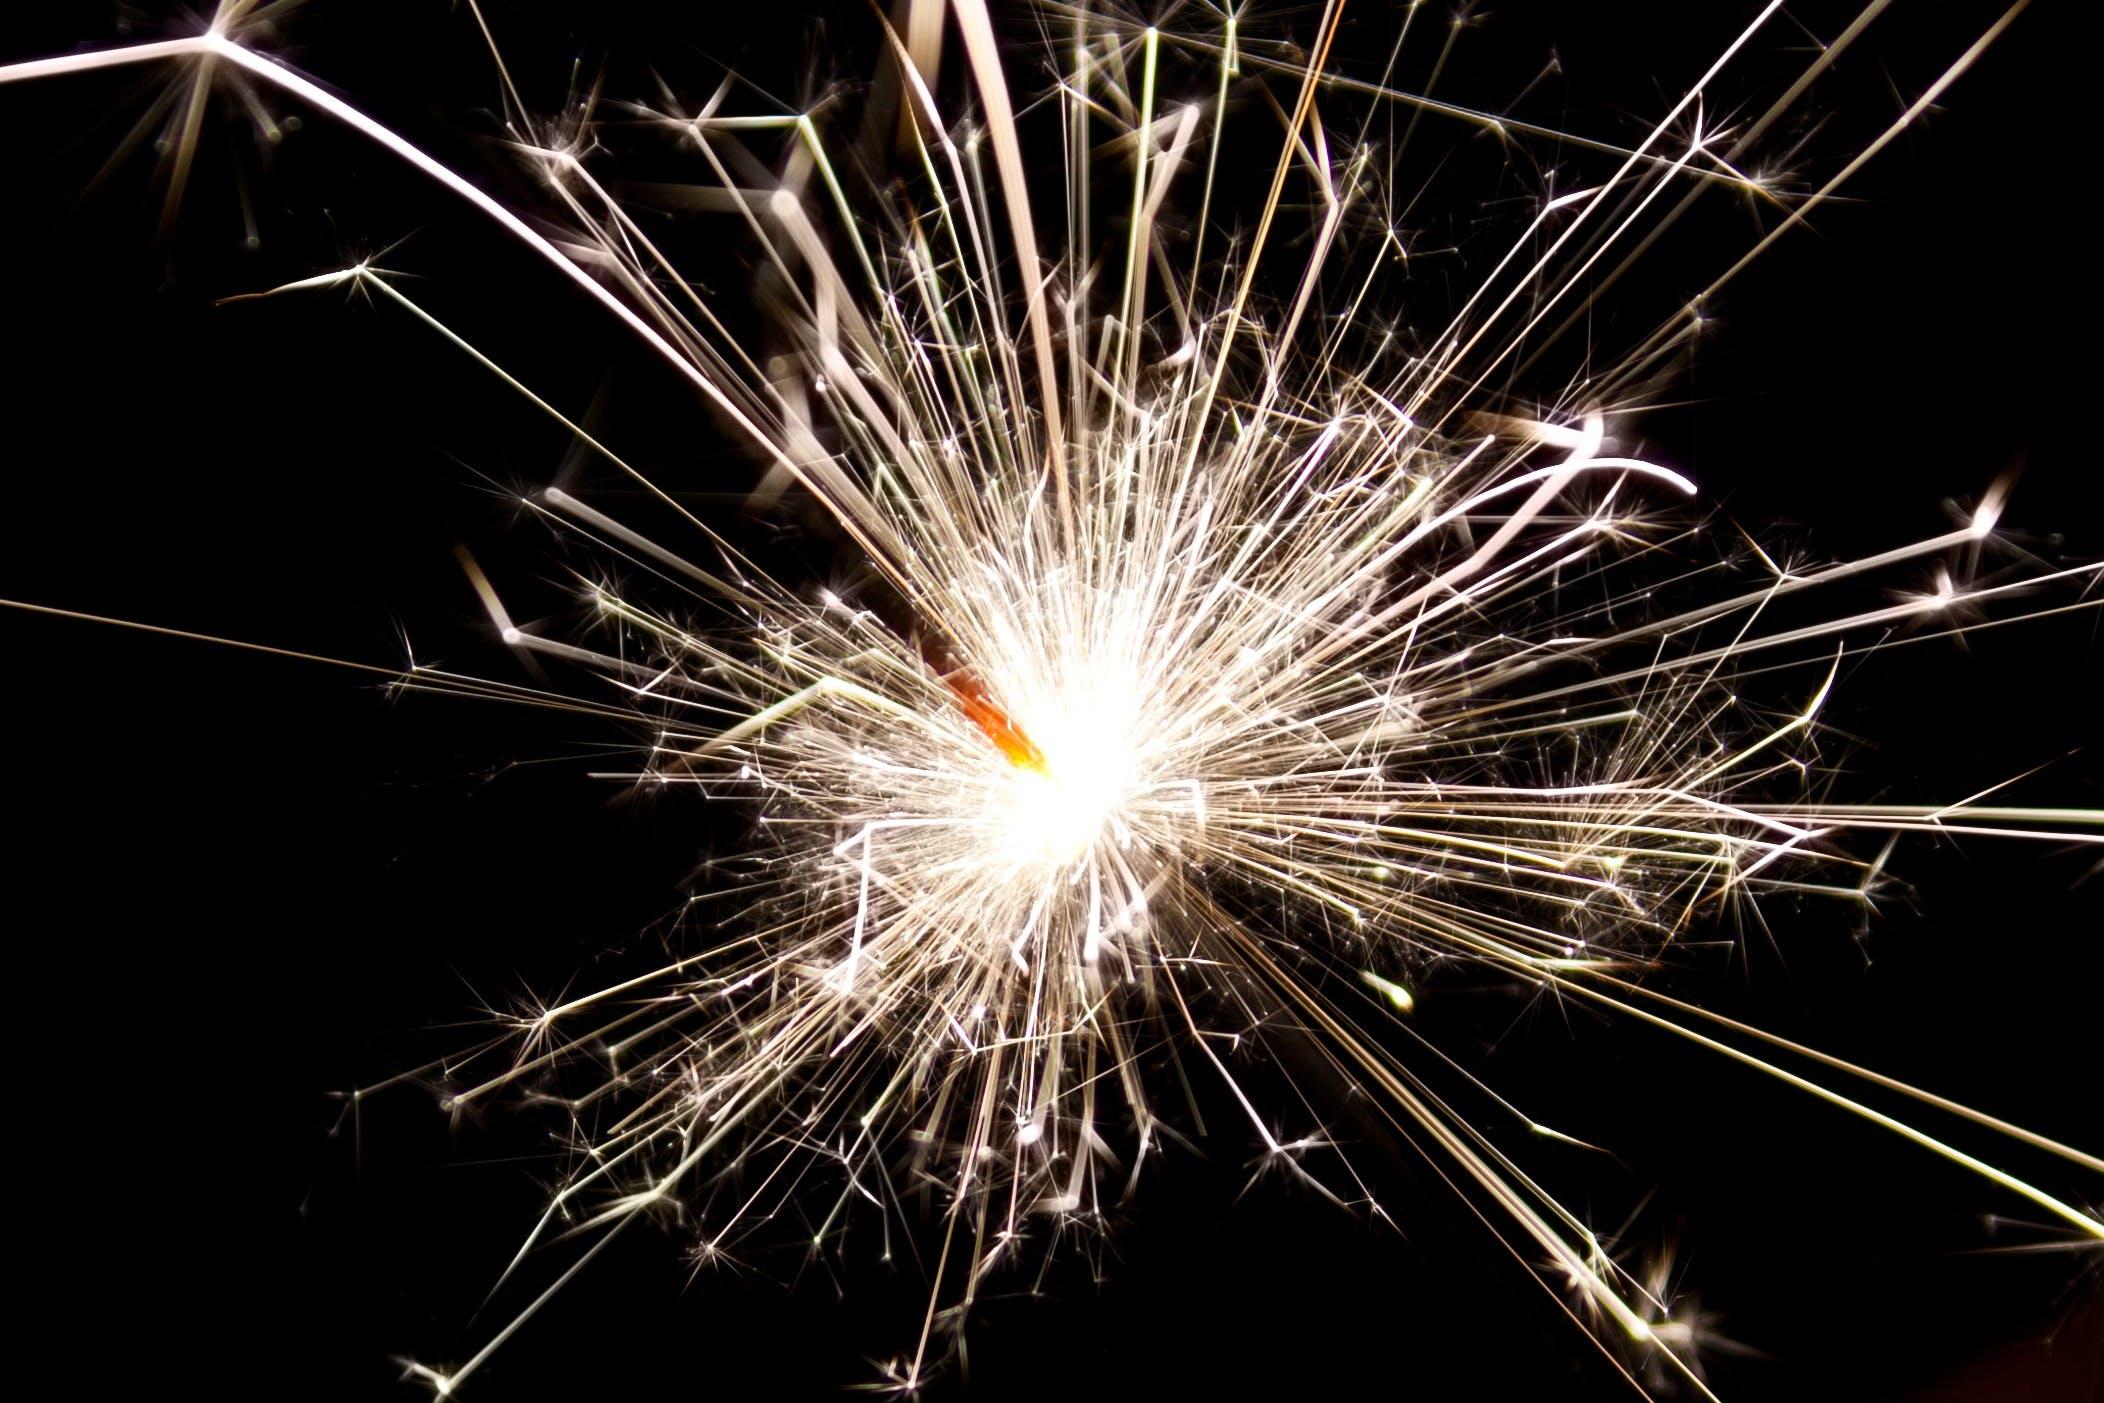 White Sparkler during Night Time